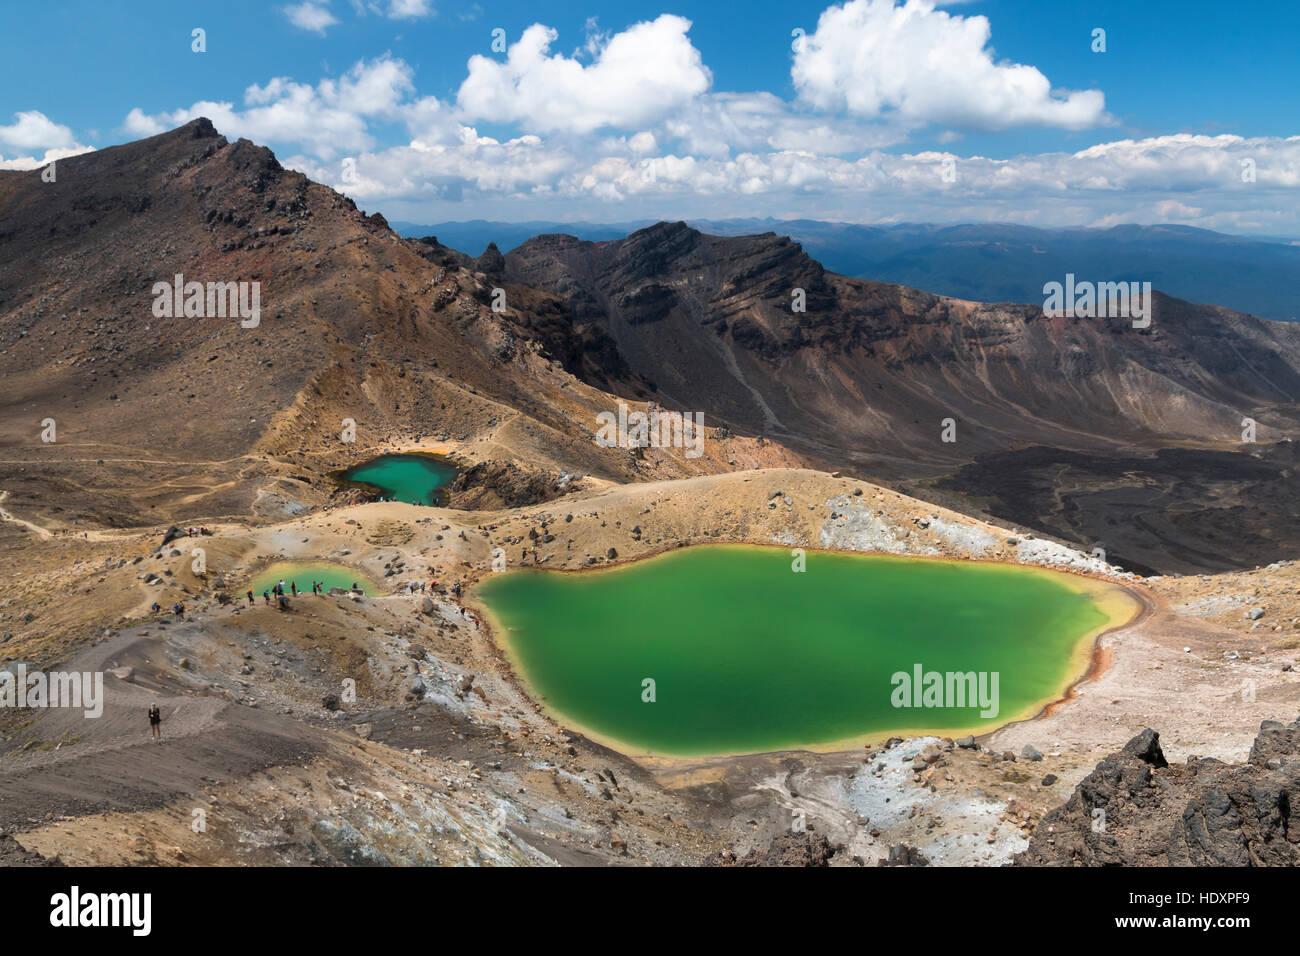 Emerald Lakes, Tongariro National Park, New Zealand - Stock Image